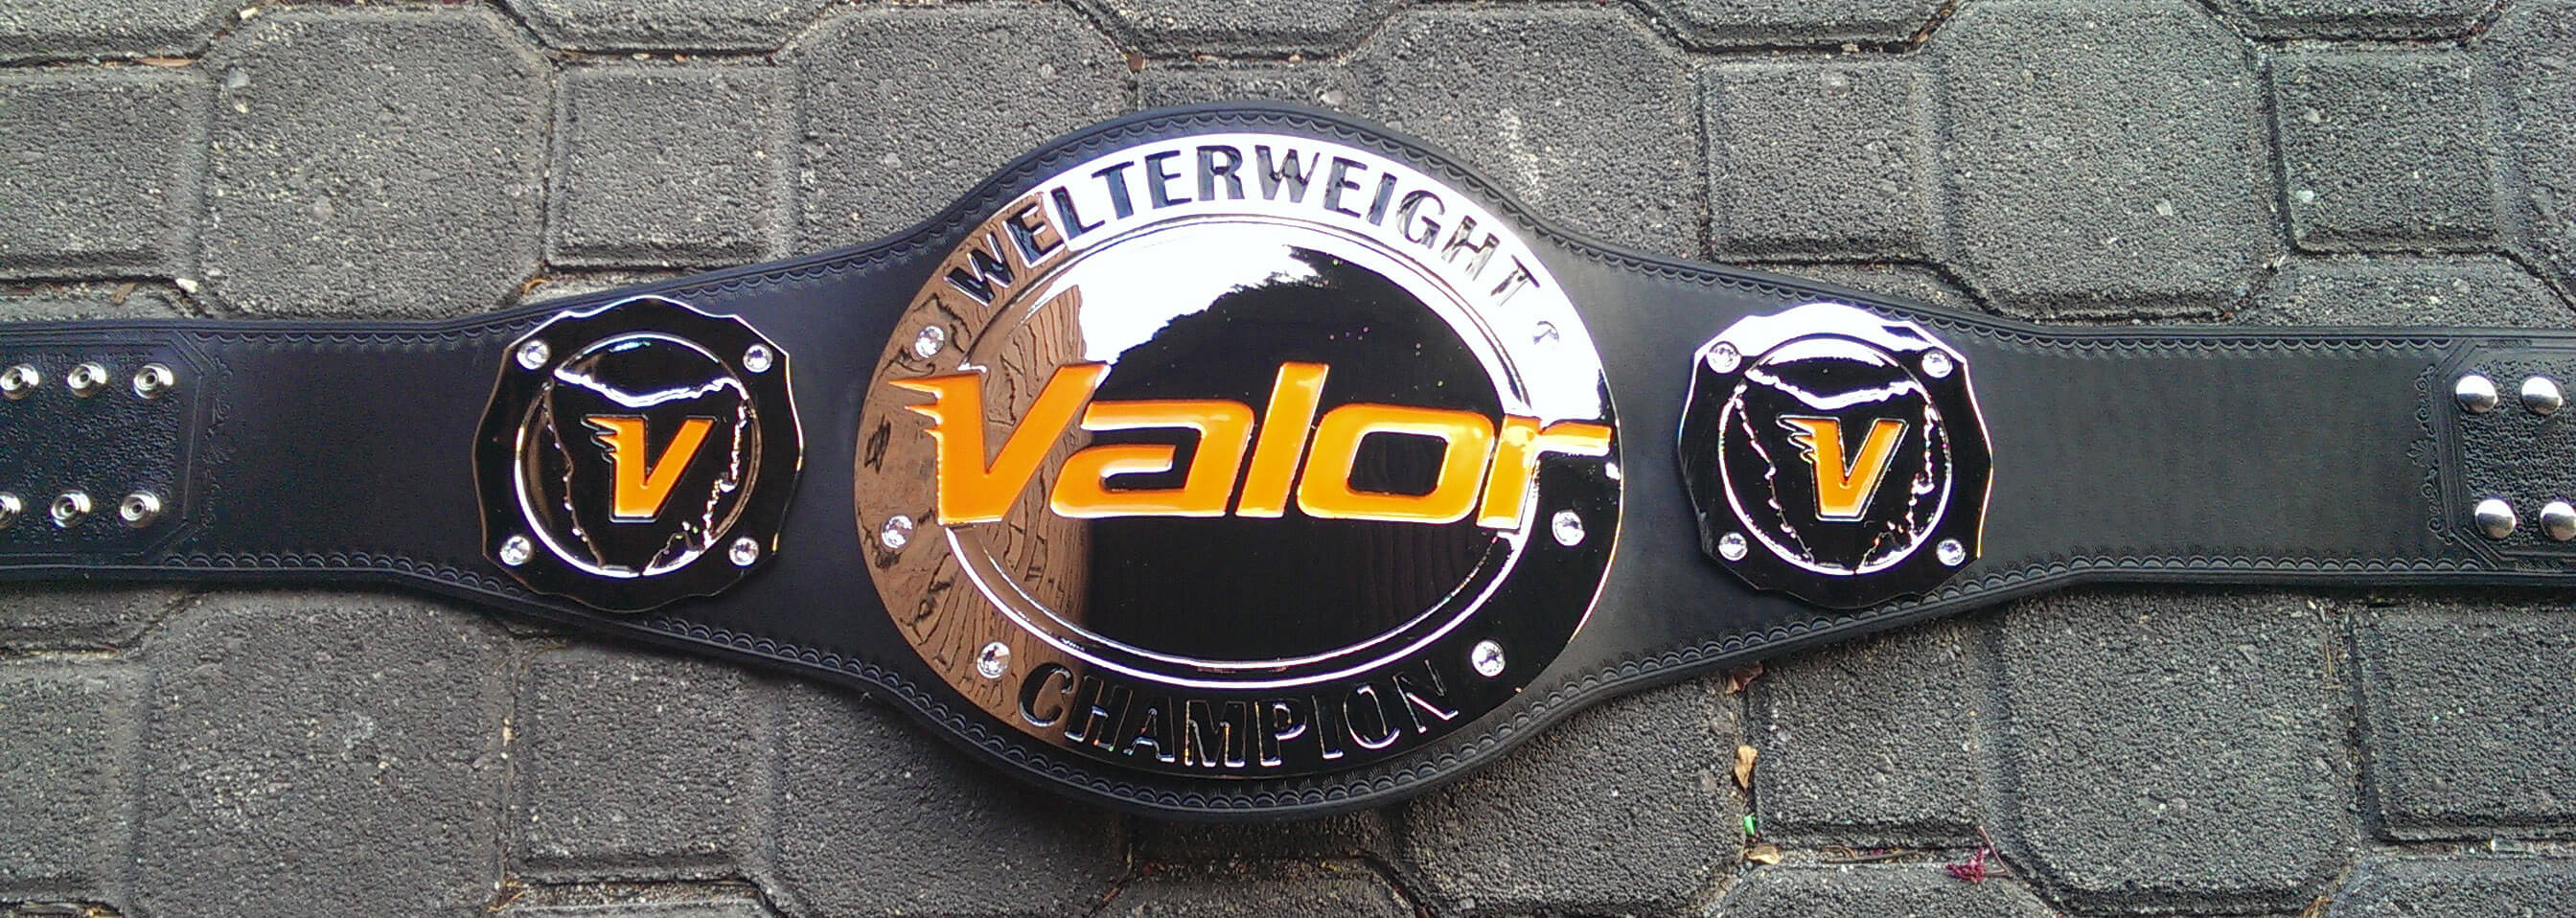 the championship